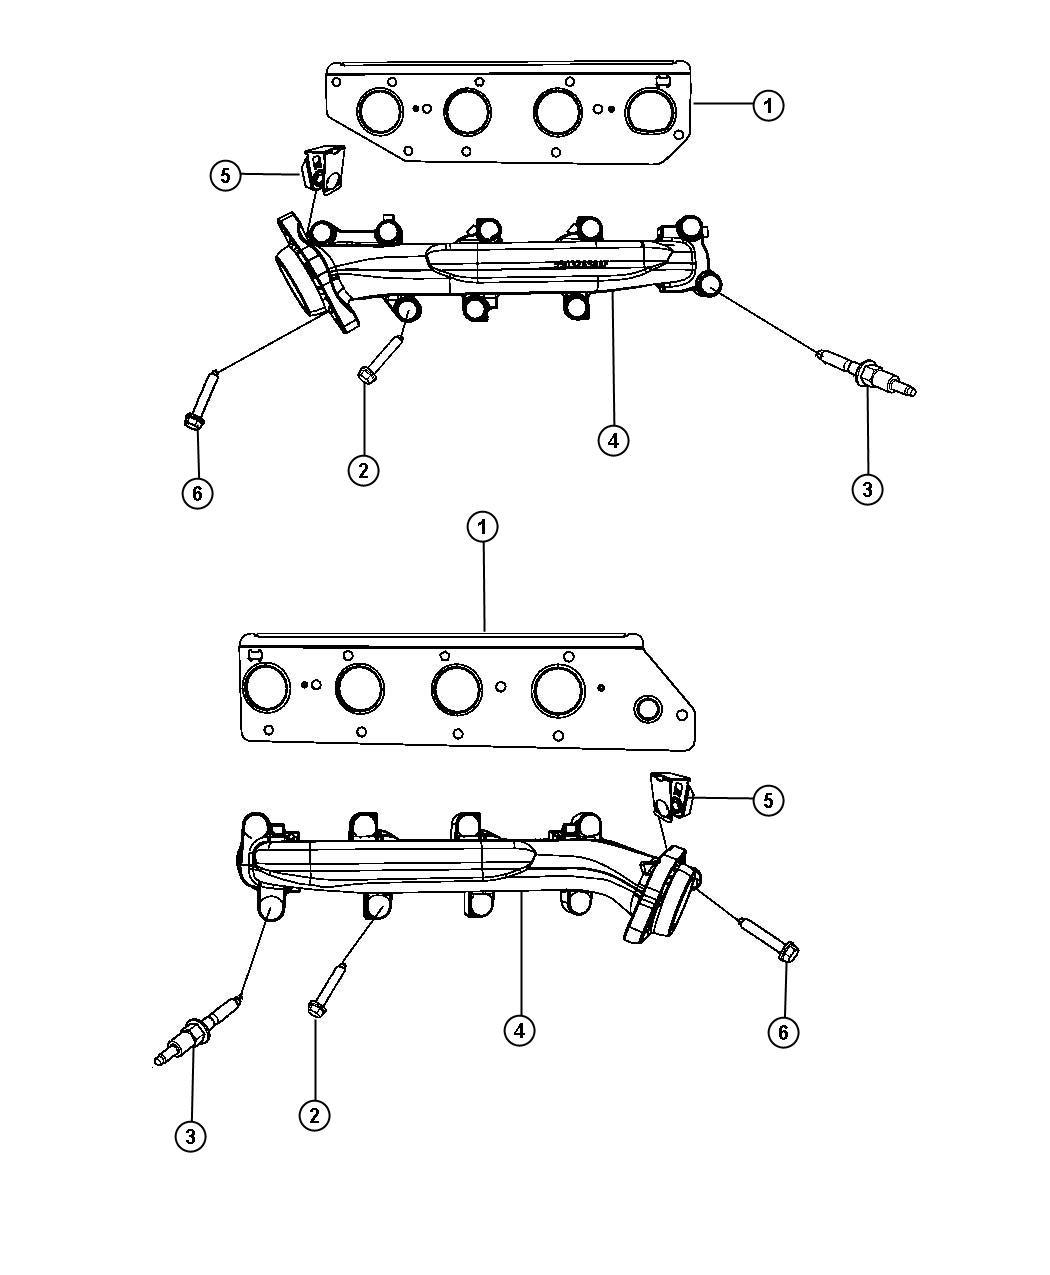 tags: #auto engine diagram#international engine parts diagrams#engine fuel  diagram#sel truck engine diagram#sel engine parts diagram#ford 292 engine